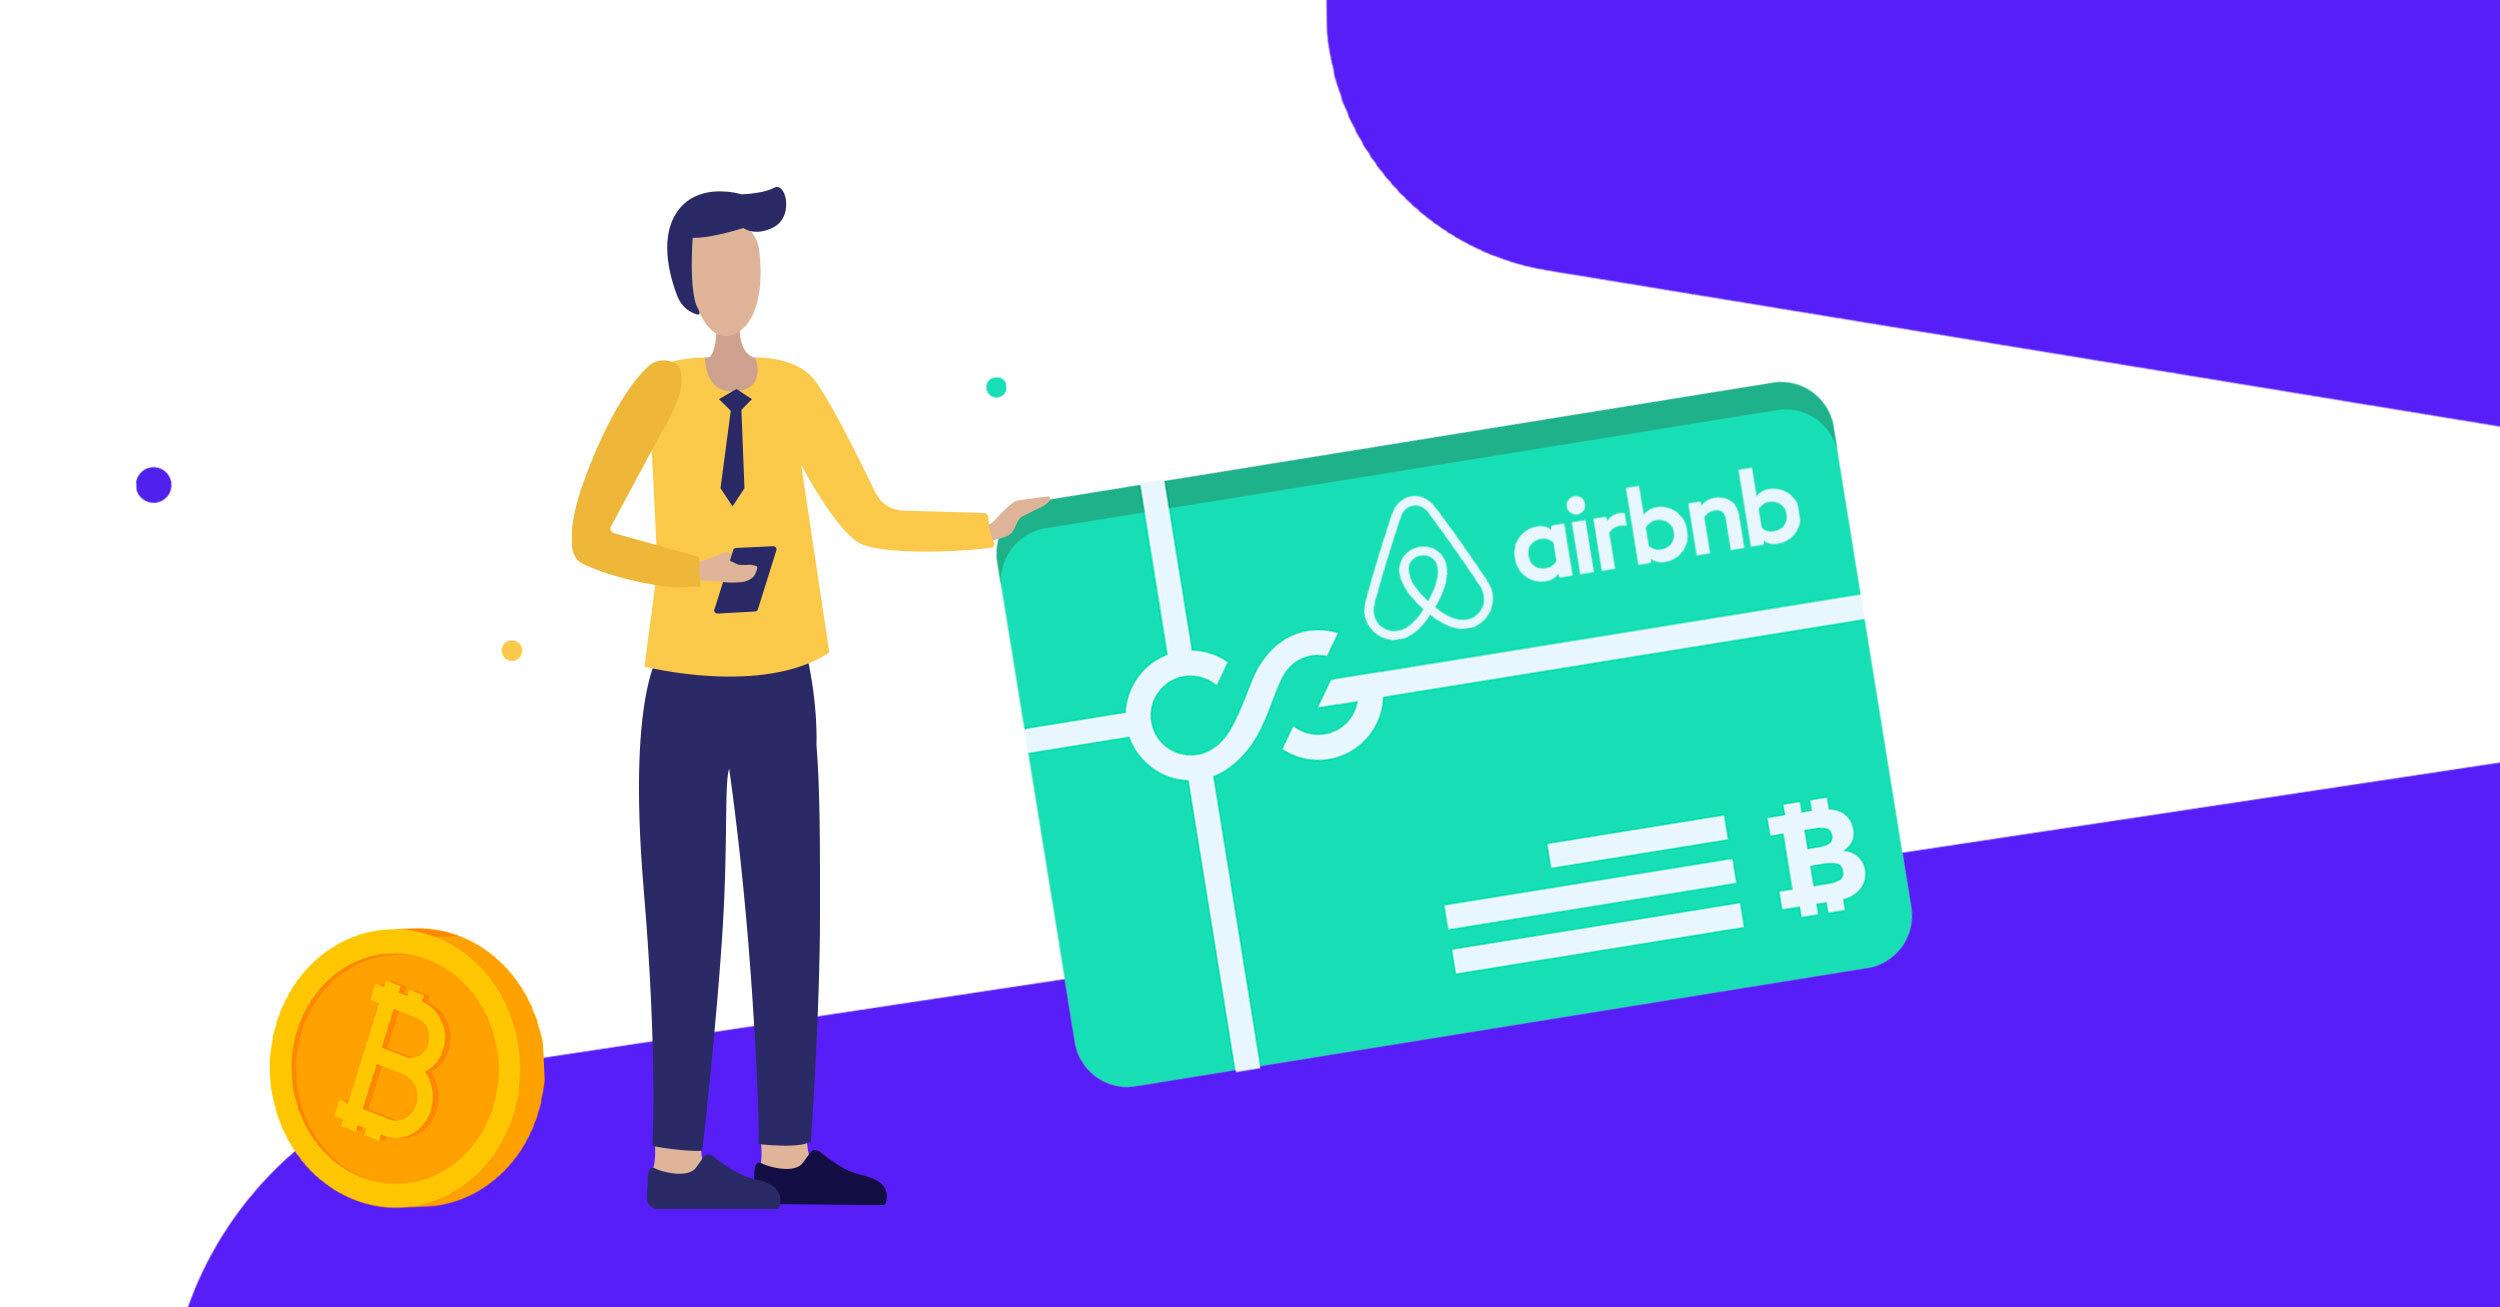 airbnb btc